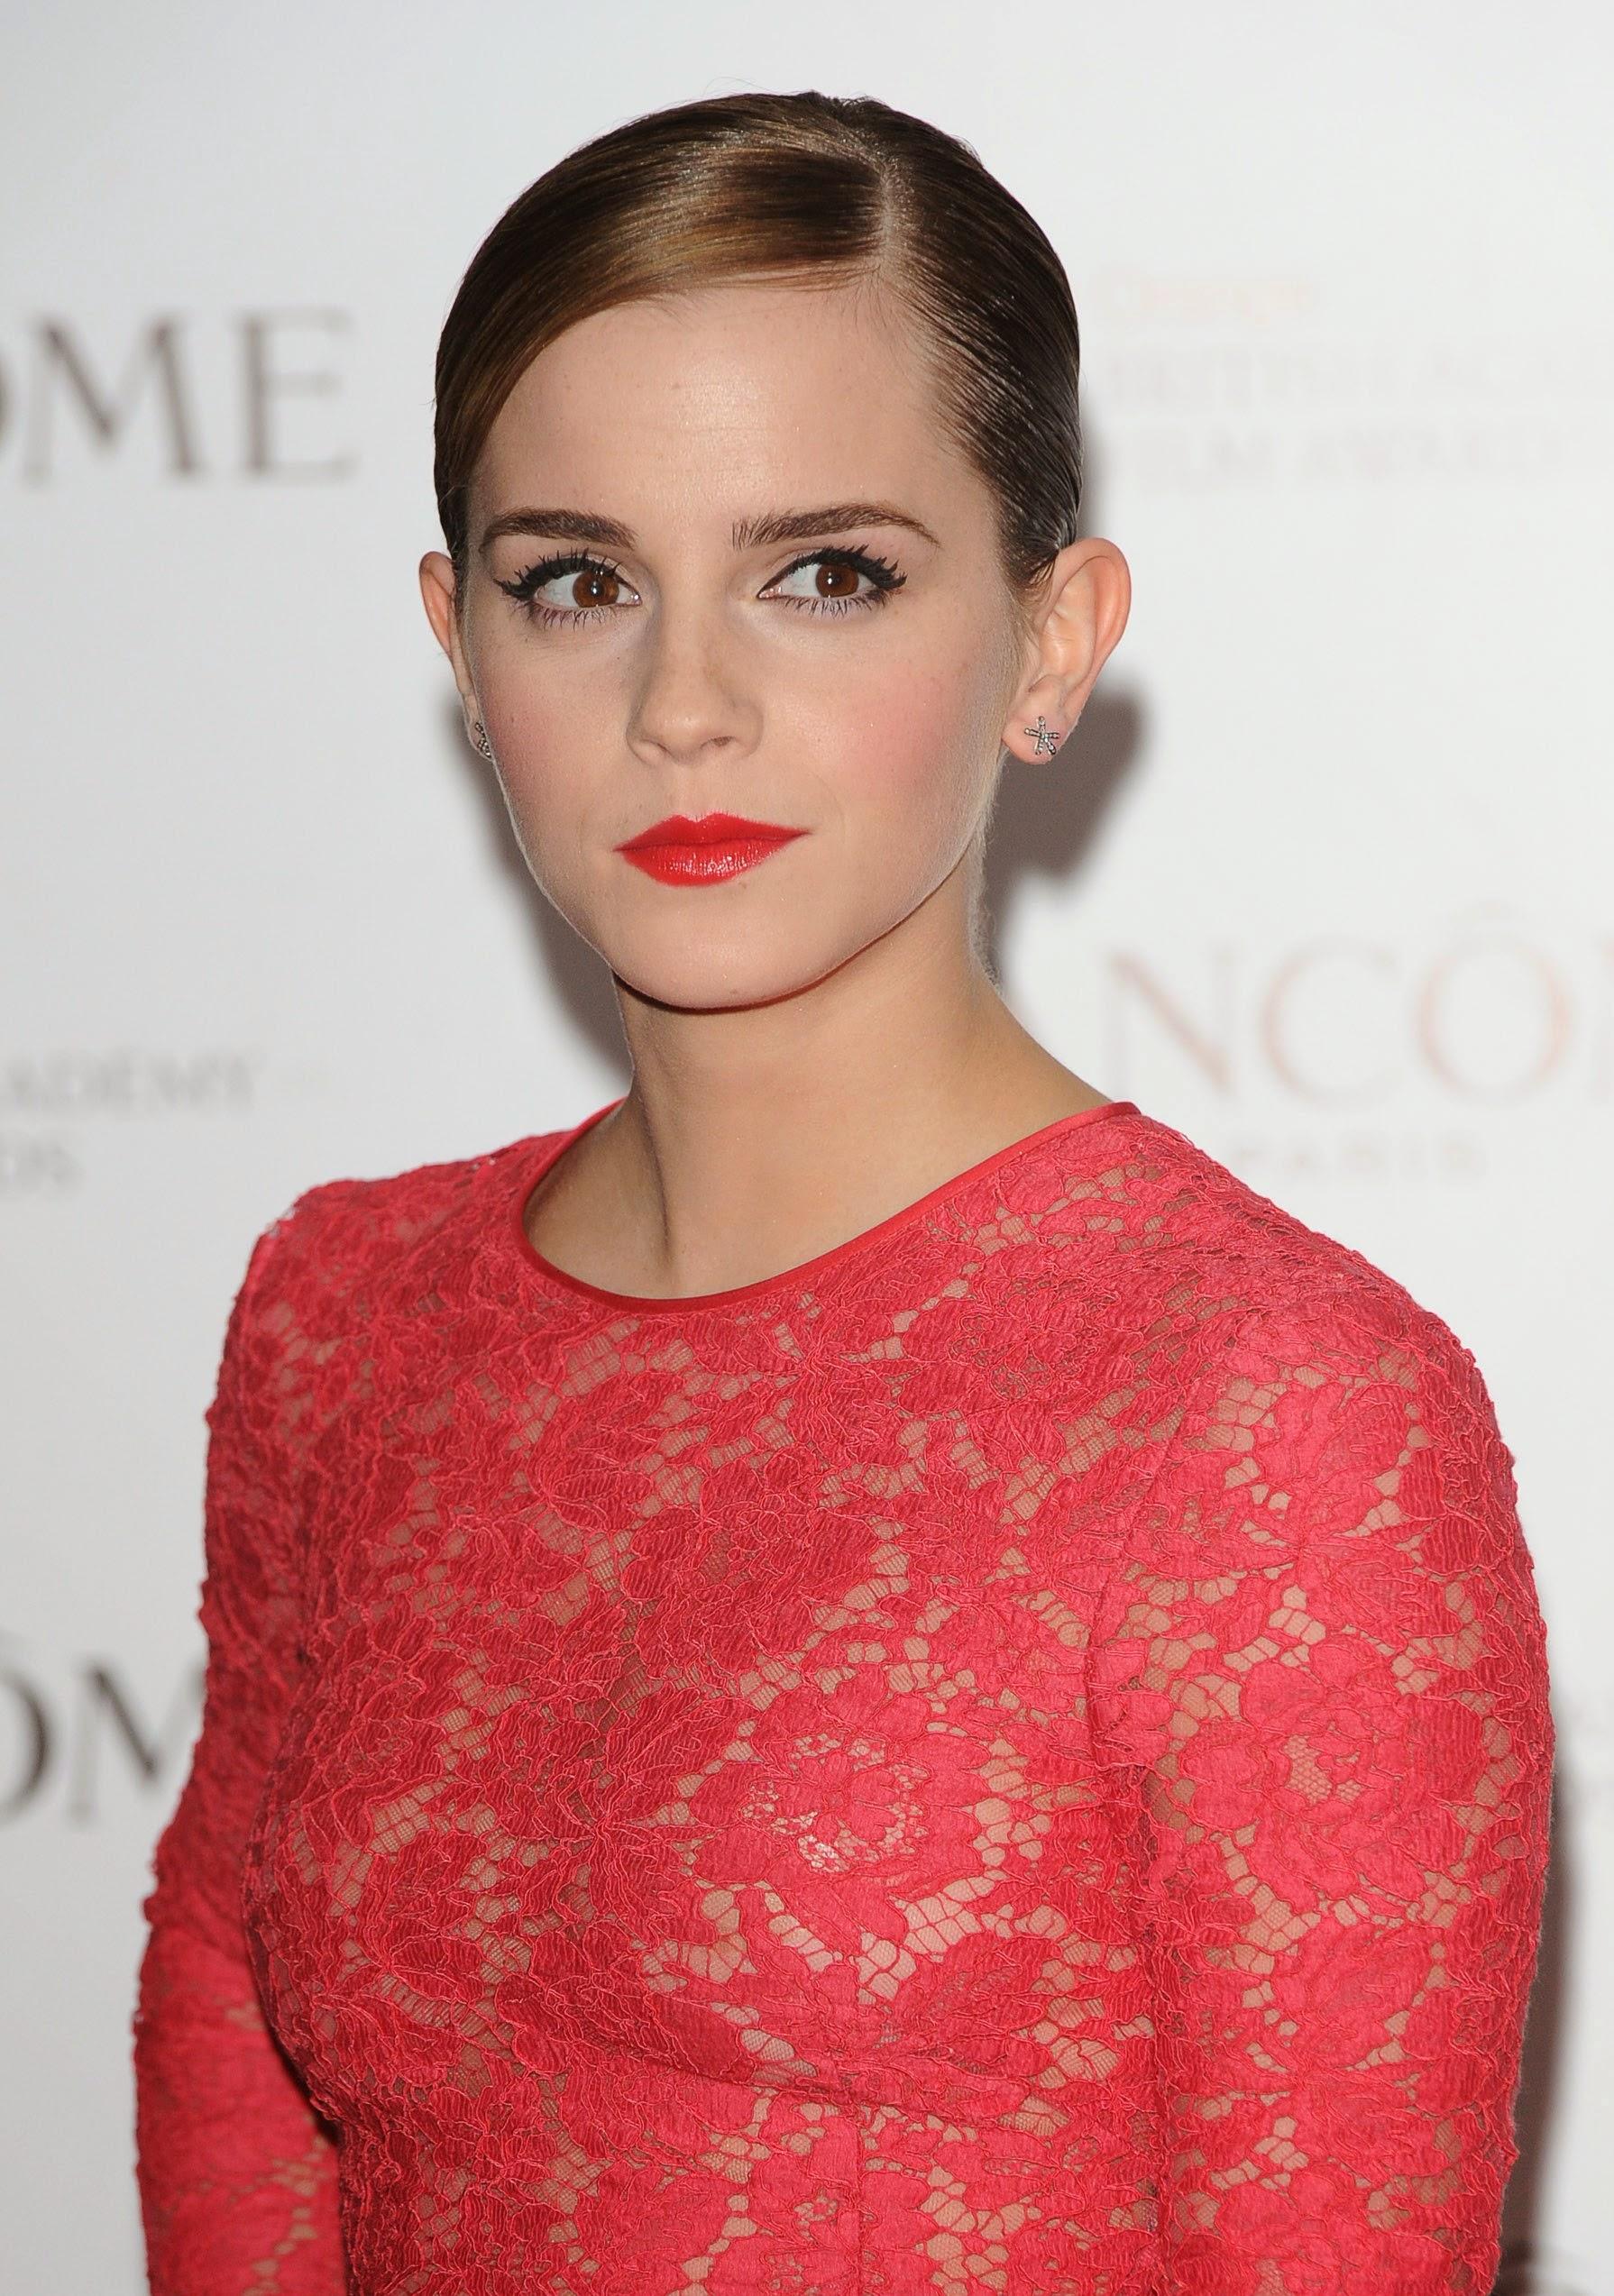 Nude Emma Watson